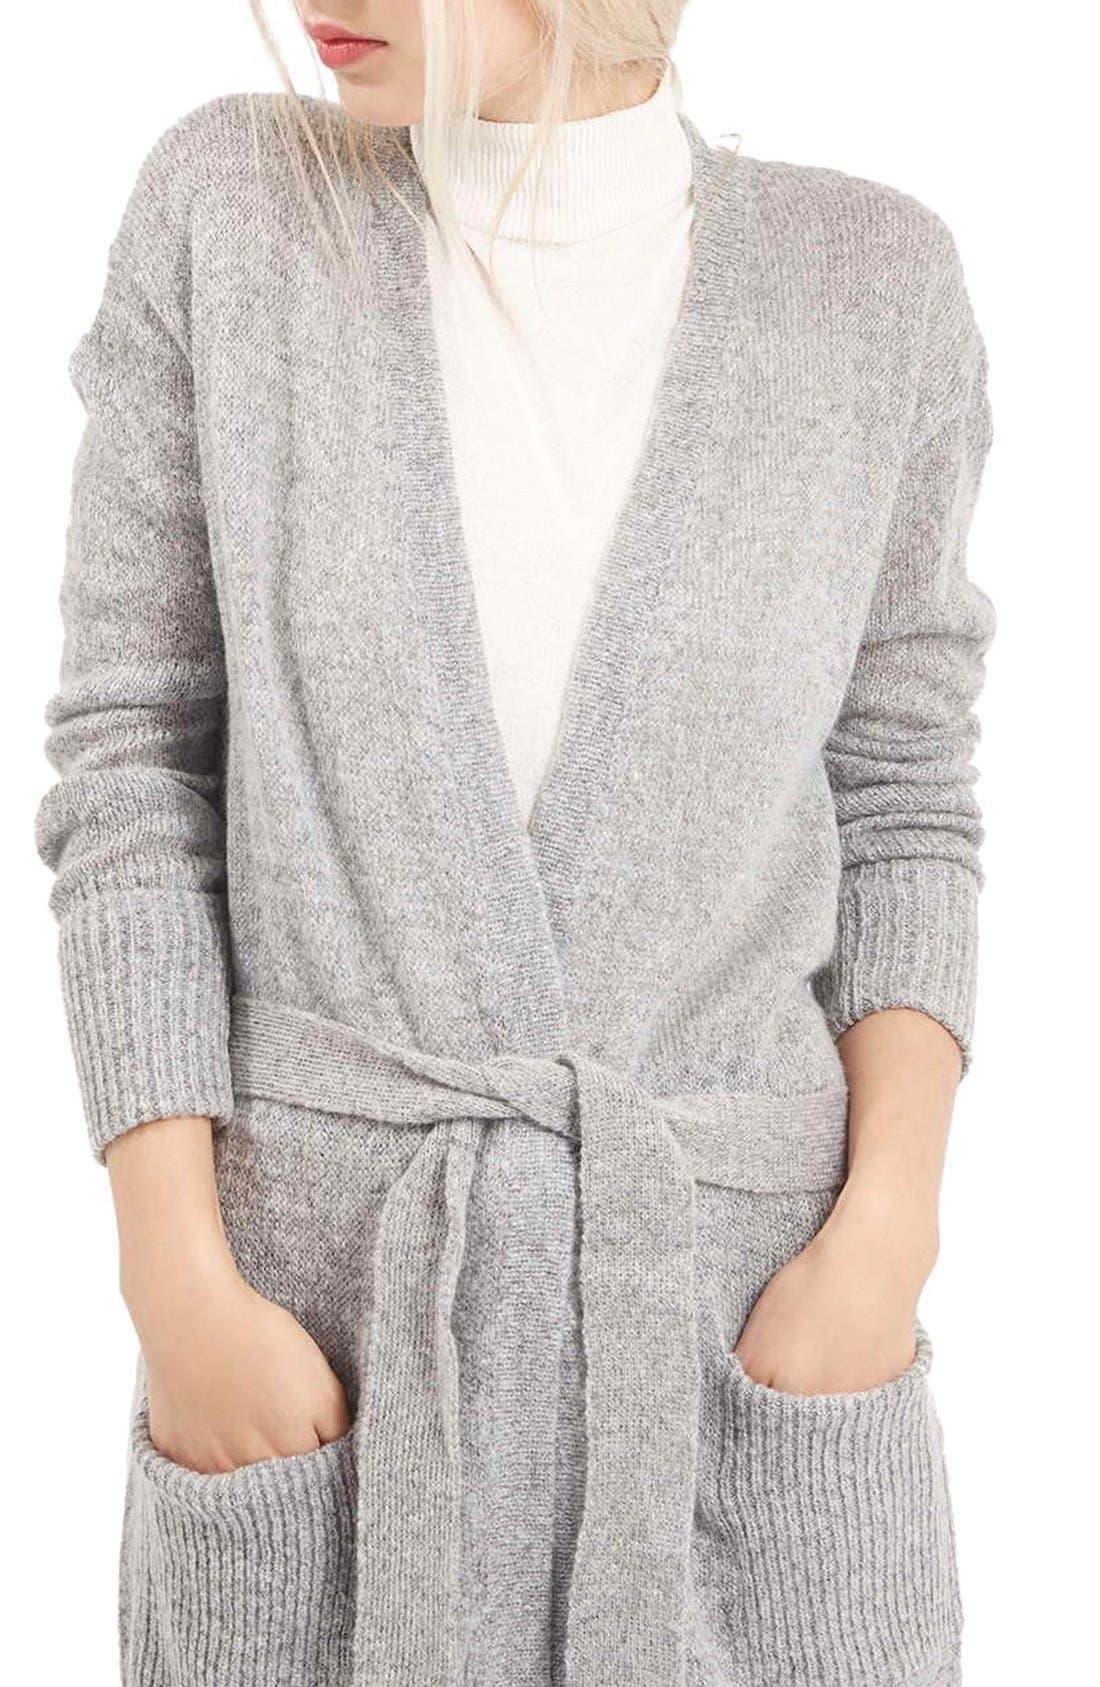 'Lulu' Belted Longline Cardigan,                             Alternate thumbnail 4, color,                             Light Grey